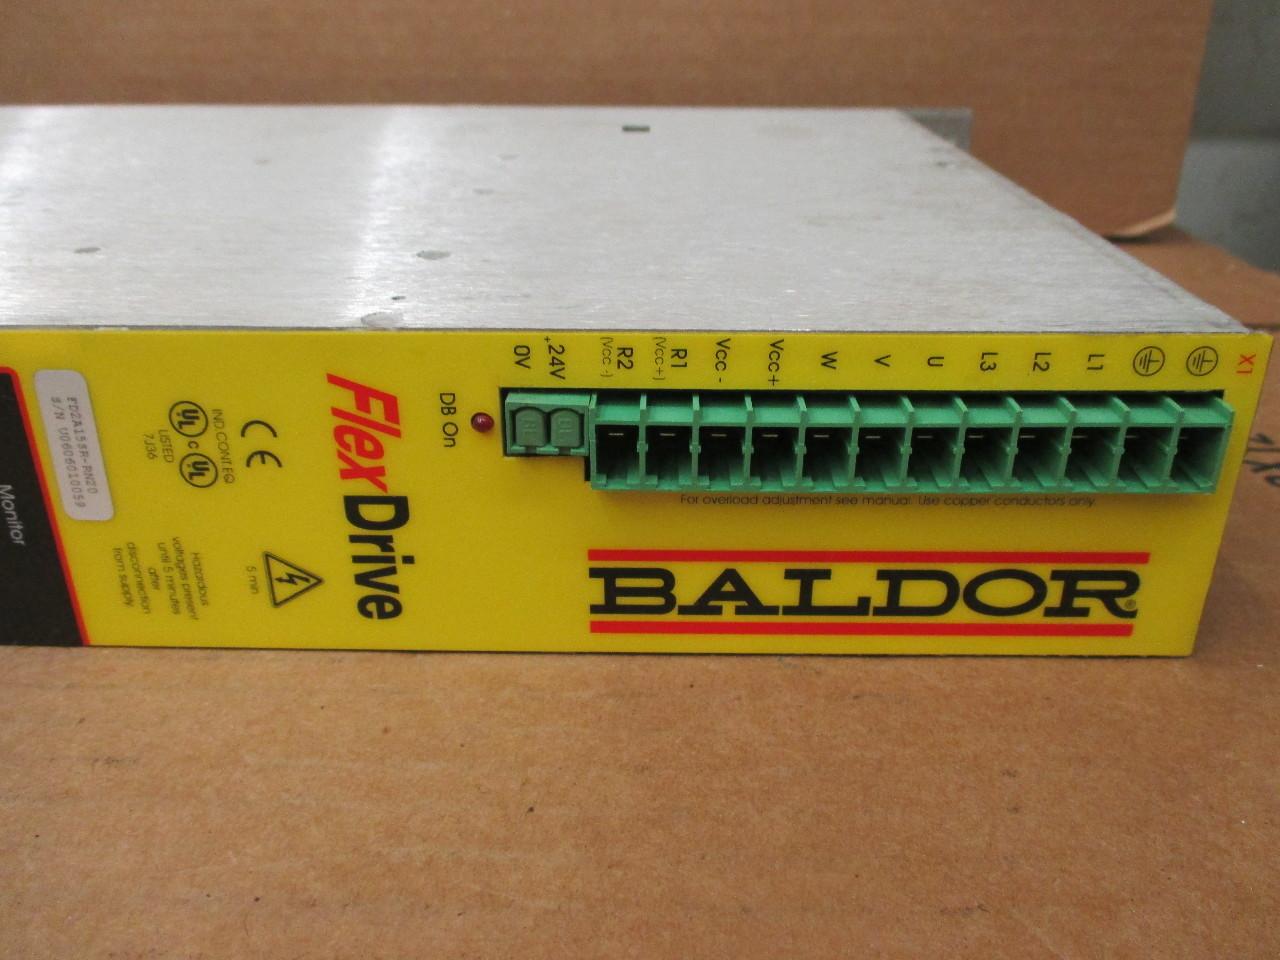 Baldor flex drive ii manual xilussage.